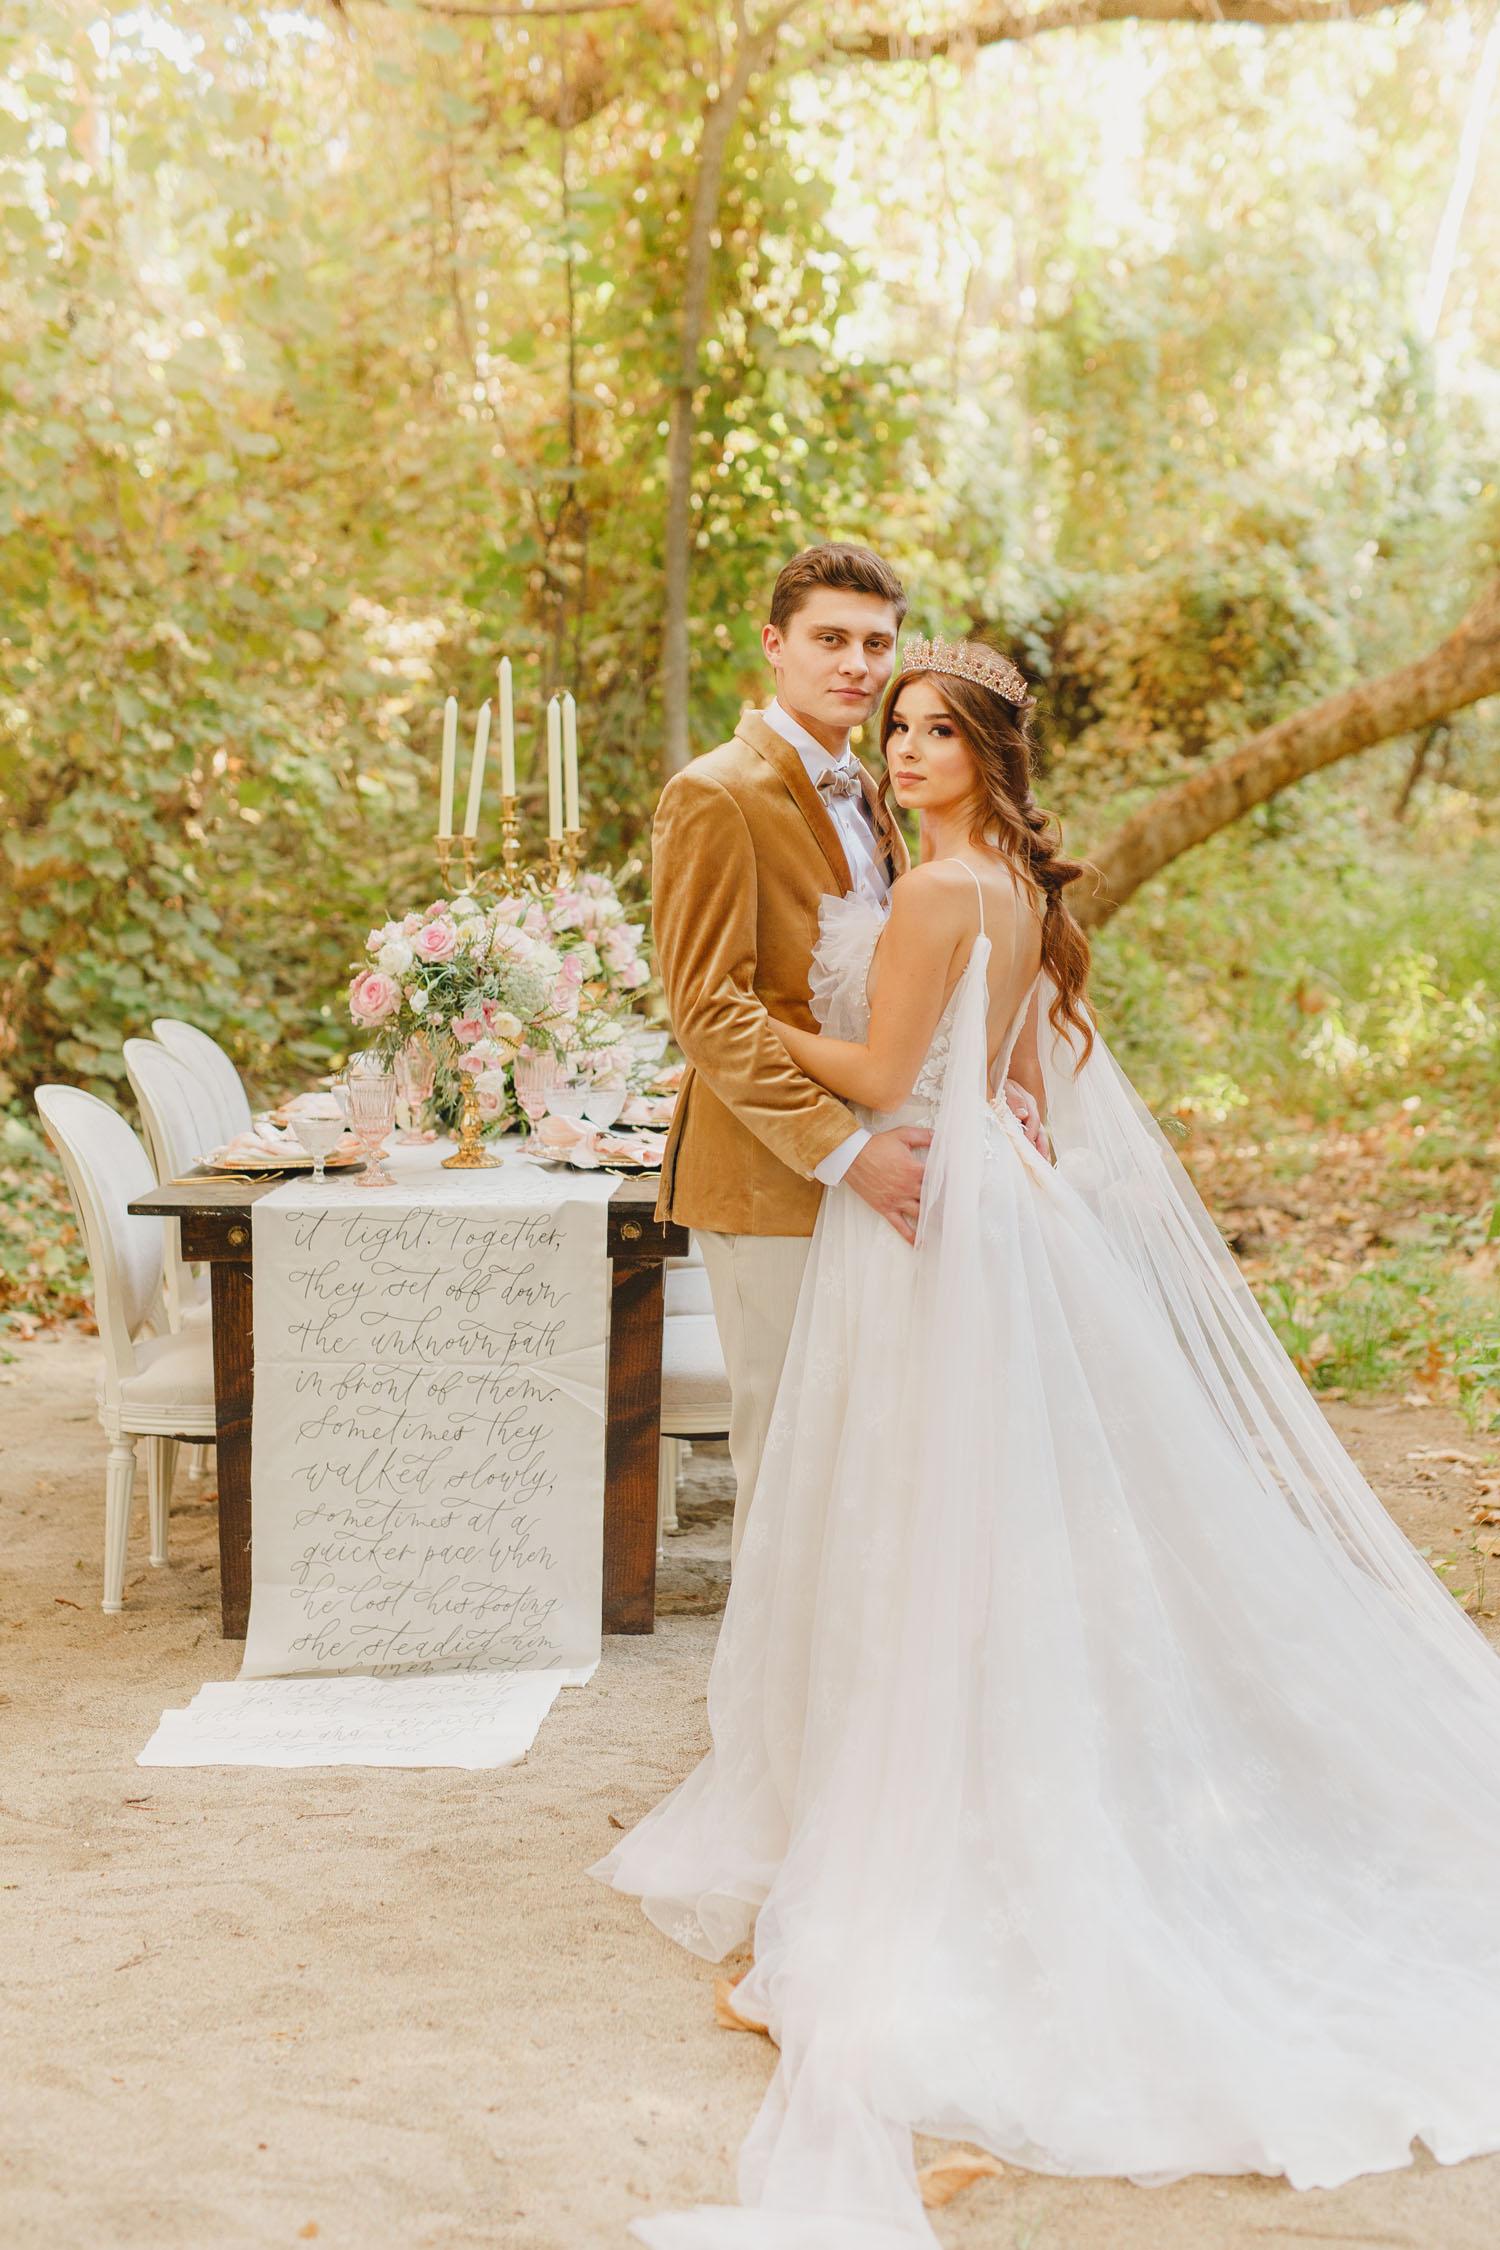 Luxury Fairytale Forest Wedding Inspiration